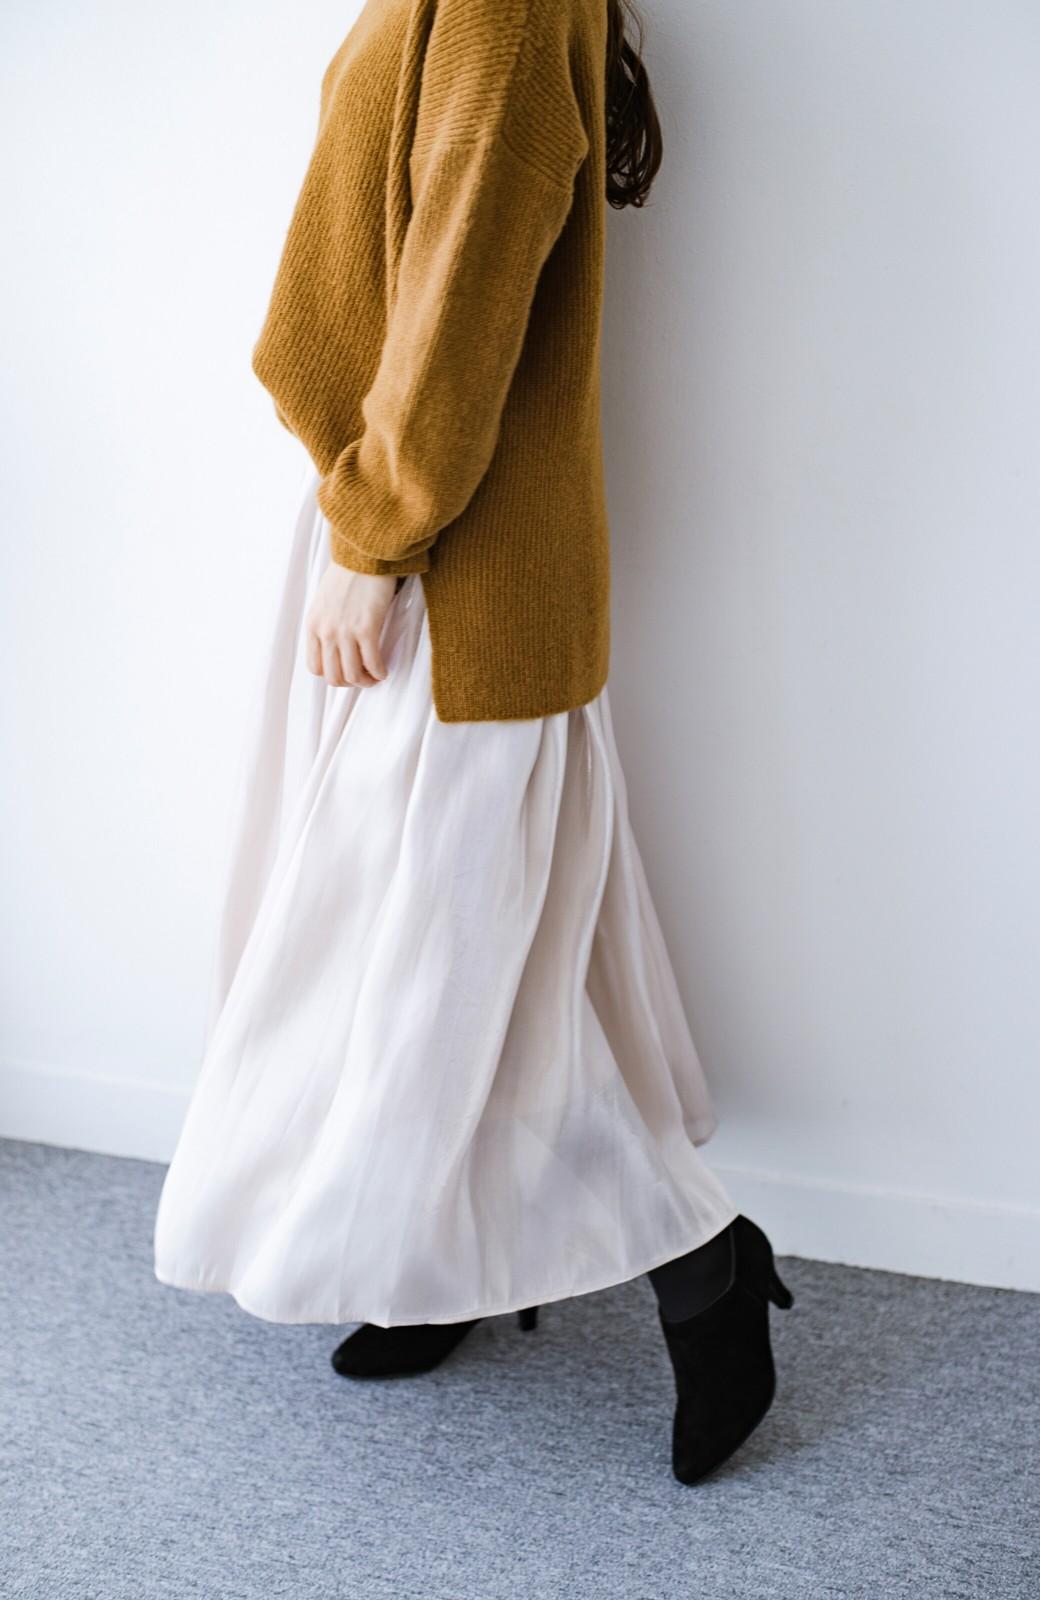 haco! 【人気のため新色追加!】1枚でも重ね着にも便利なキラキラ素材がかわいいロングスカート by laulea <アイボリー>の商品写真4